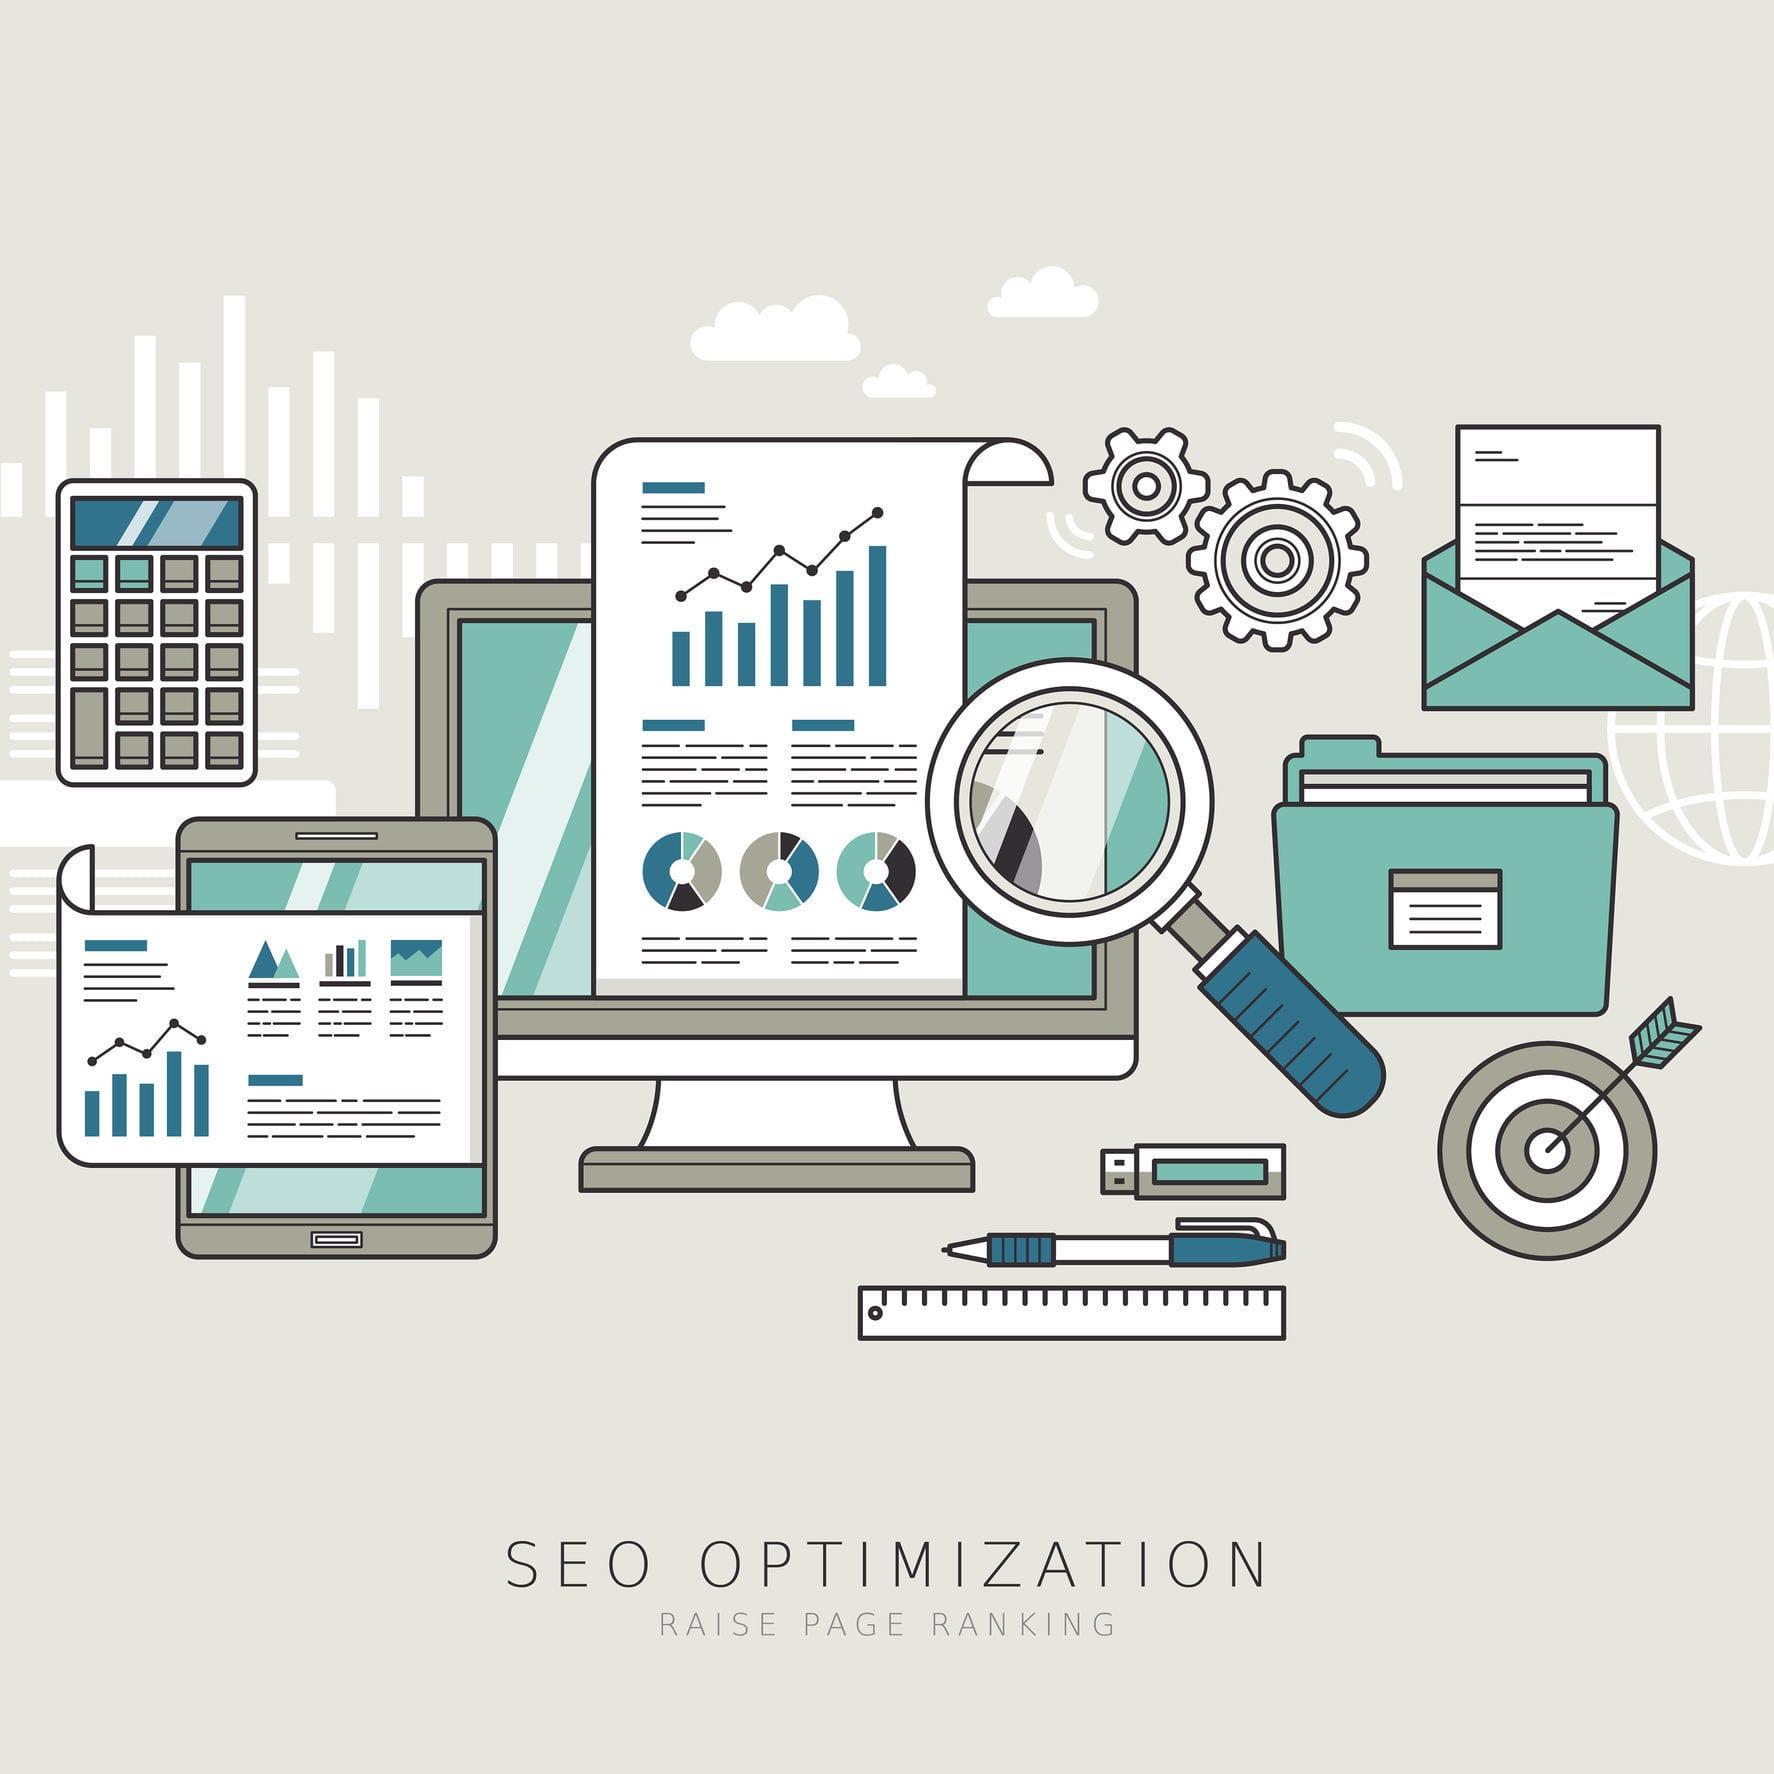 SEO optimization Professional Marketing software